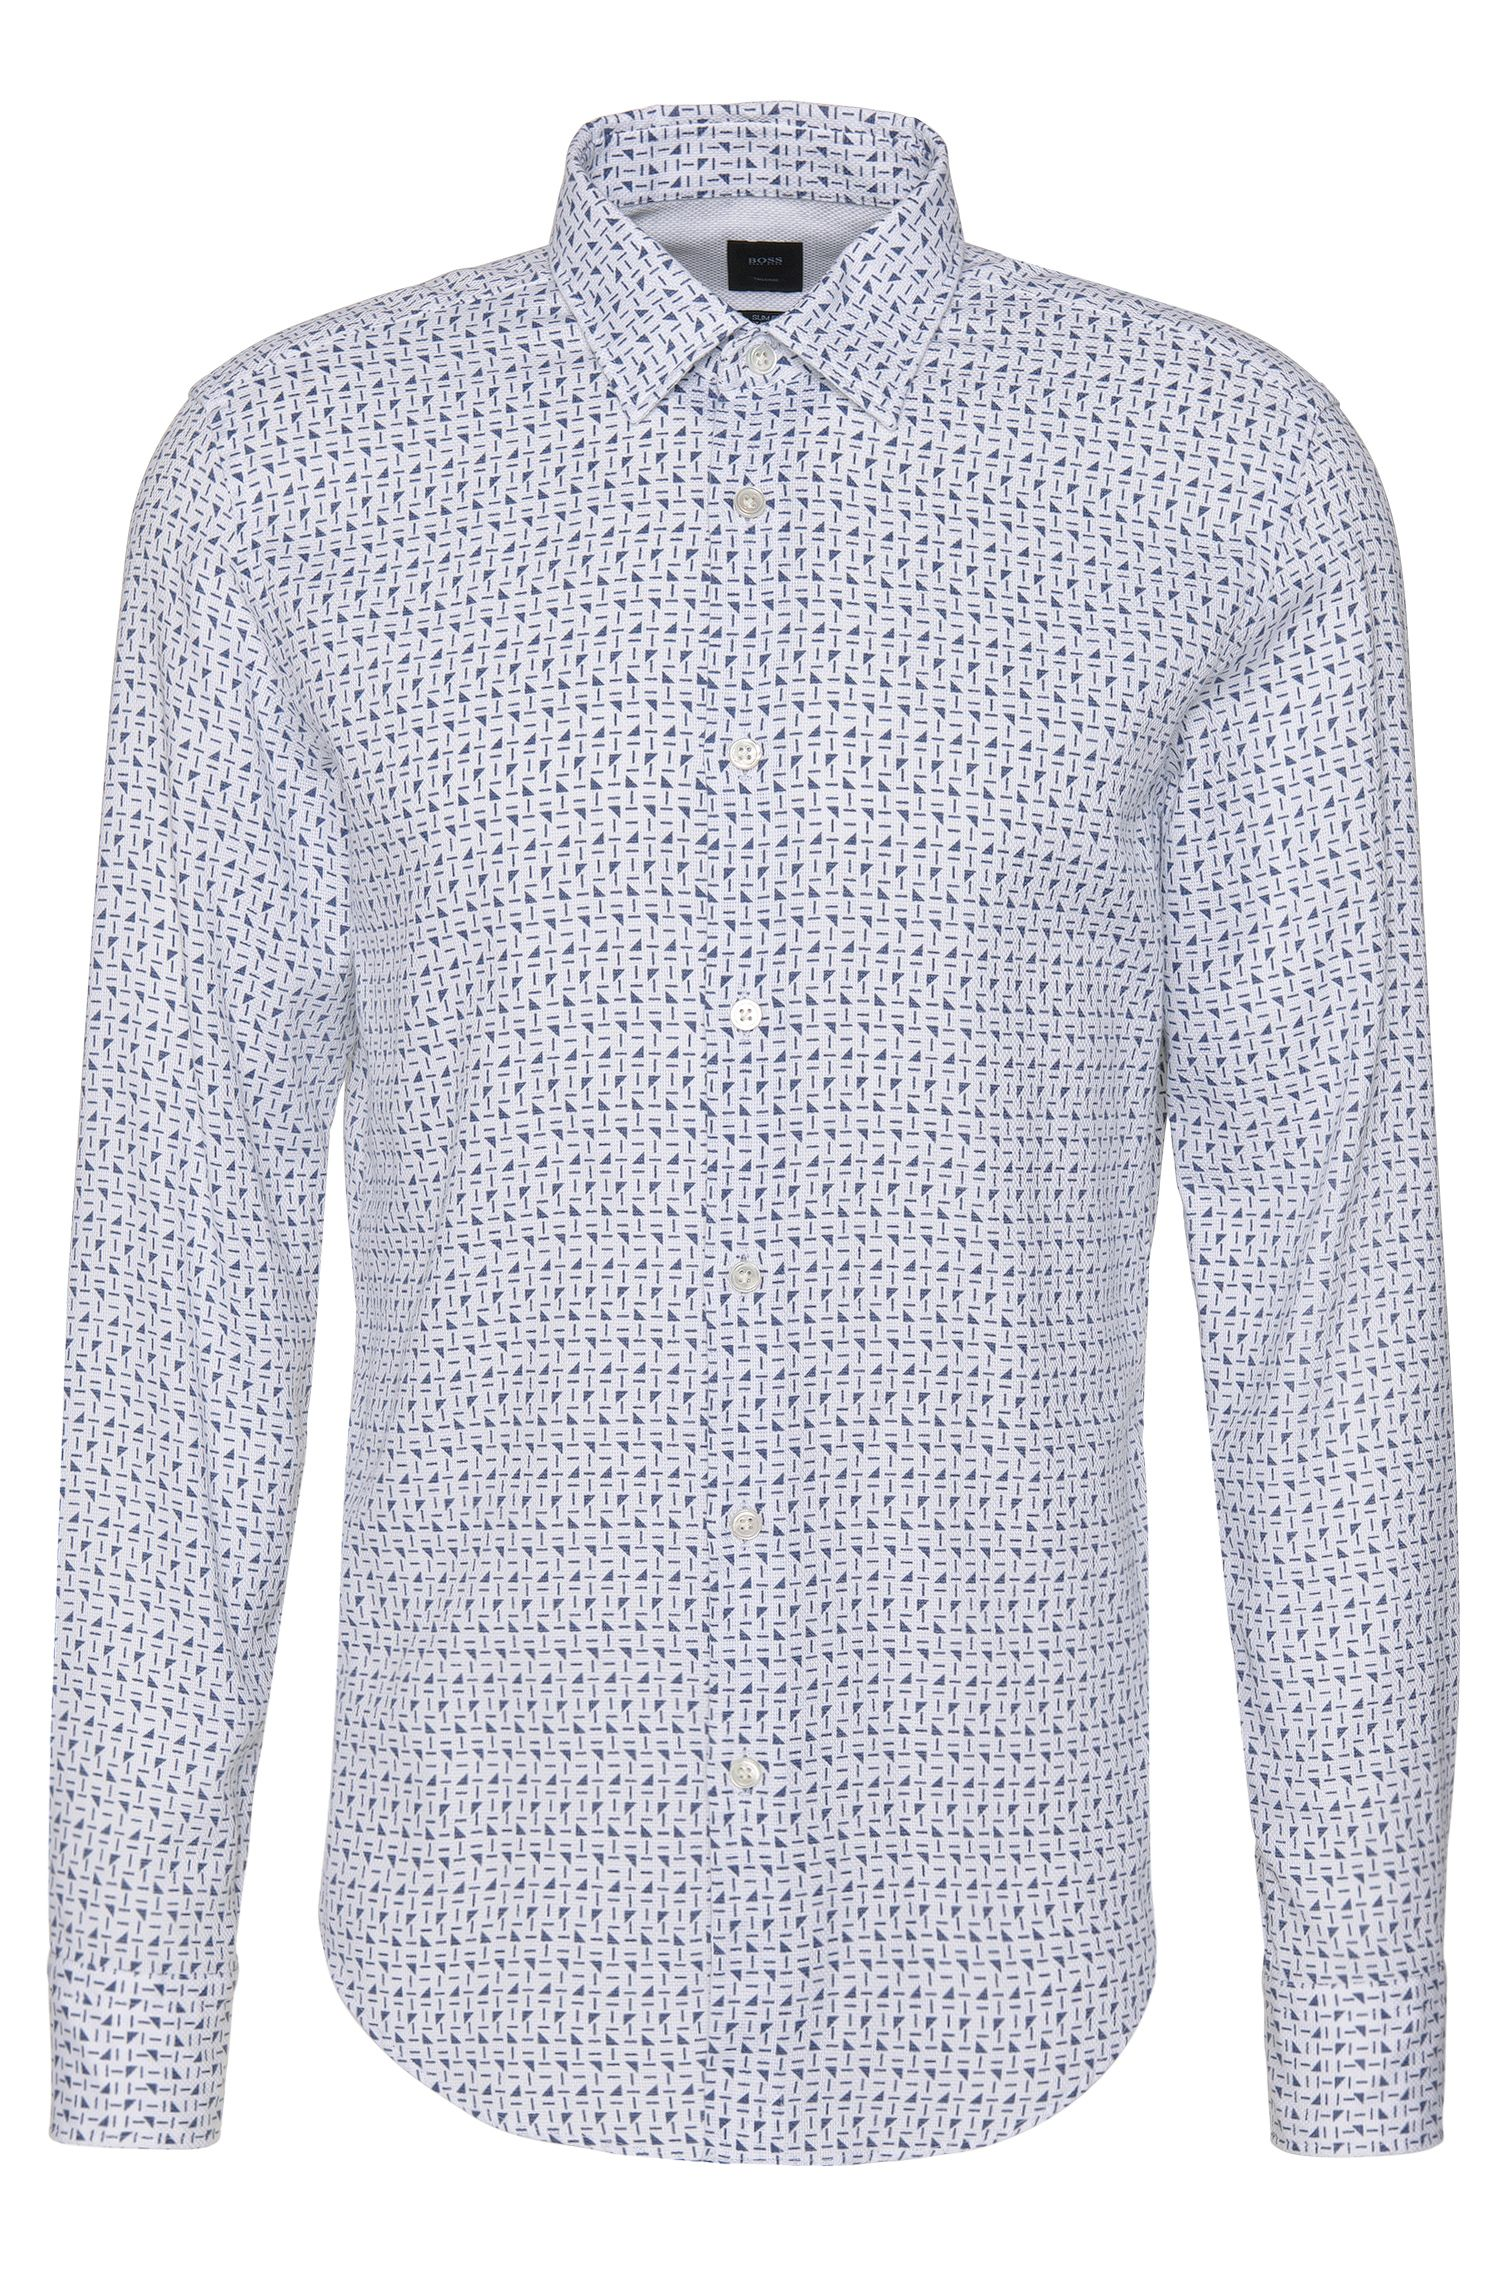 'T-Riccardo F' | Slim Fit, Italian Cotton Button Down Shirt